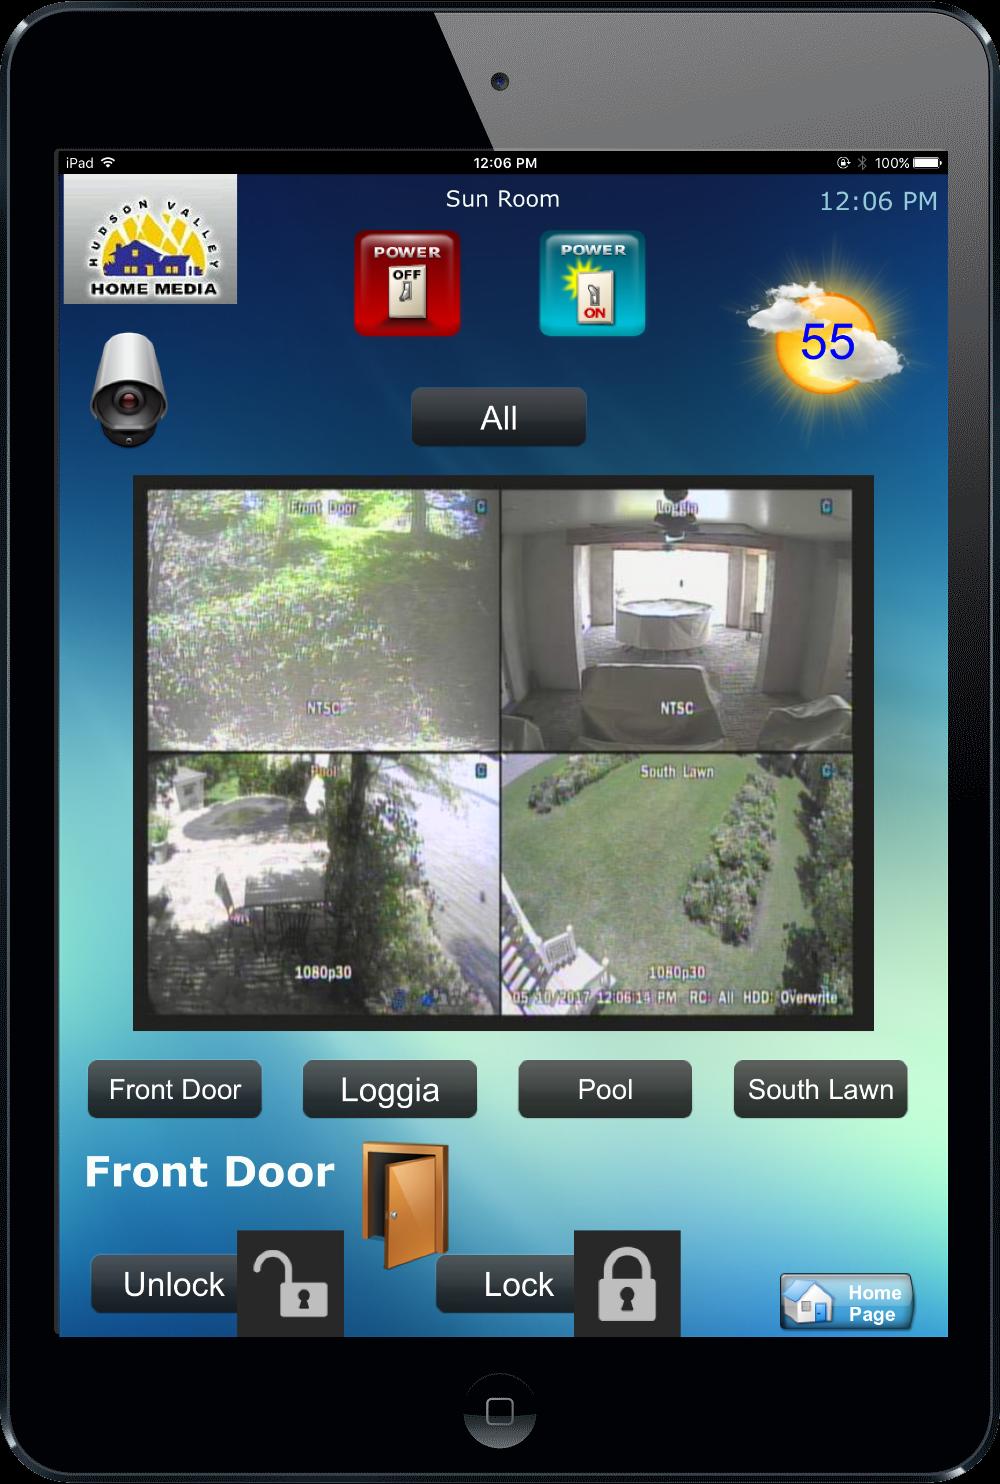 Smart Security Cameras HV Home Media Smart Home Monitoring Installation